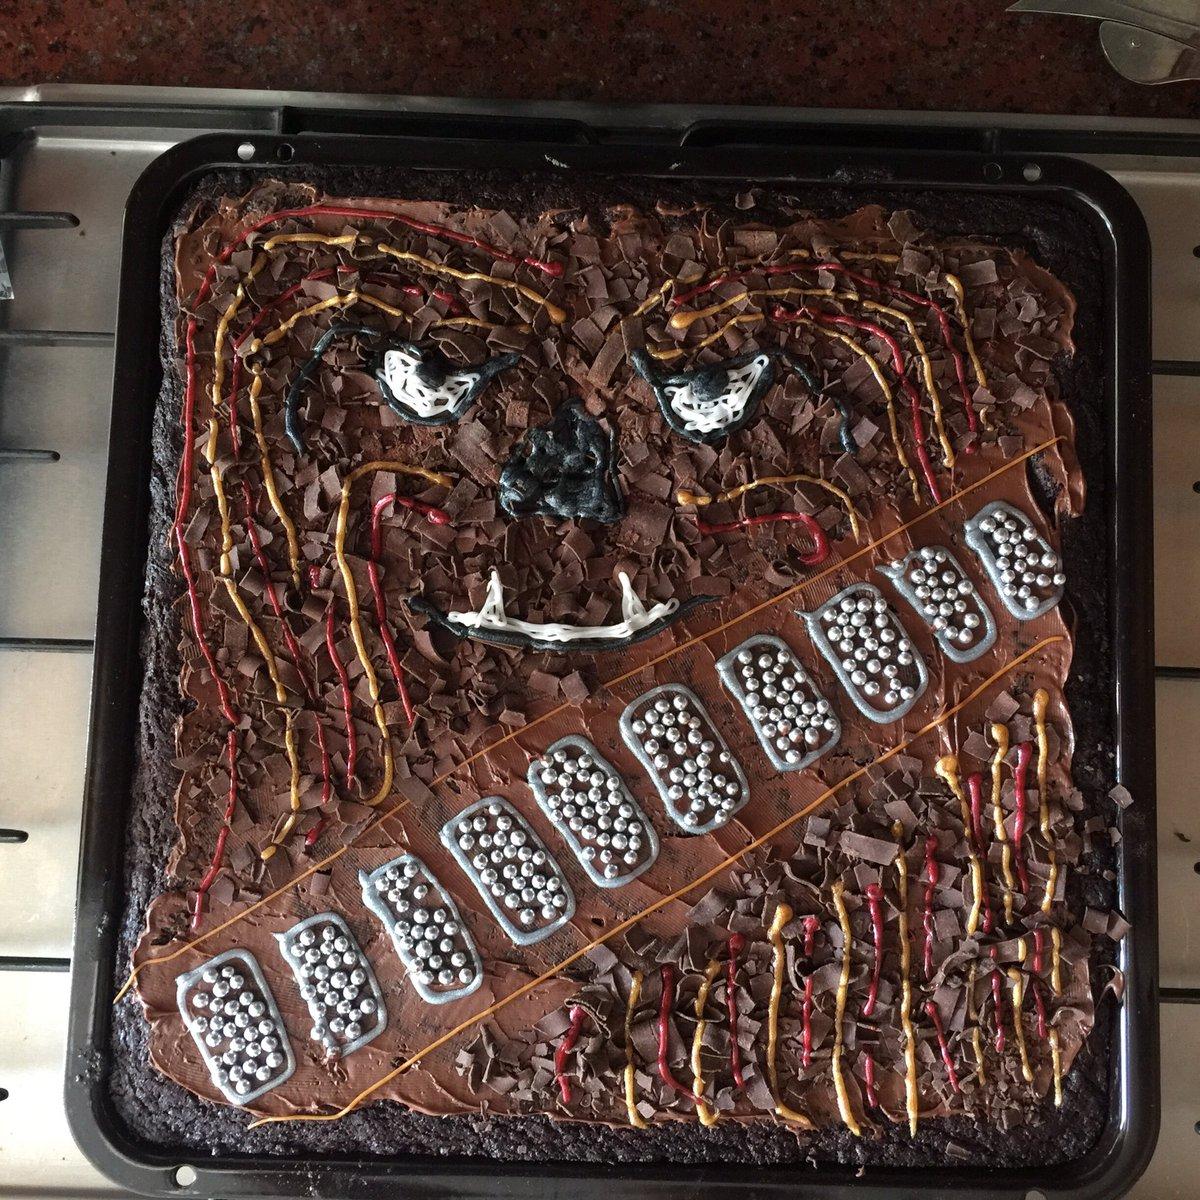 "Chocolate Chewbacca Www Dunmorecandykitchen Com: Peter Mayhew On Twitter: "".@TomvandeVen I Resemble This"